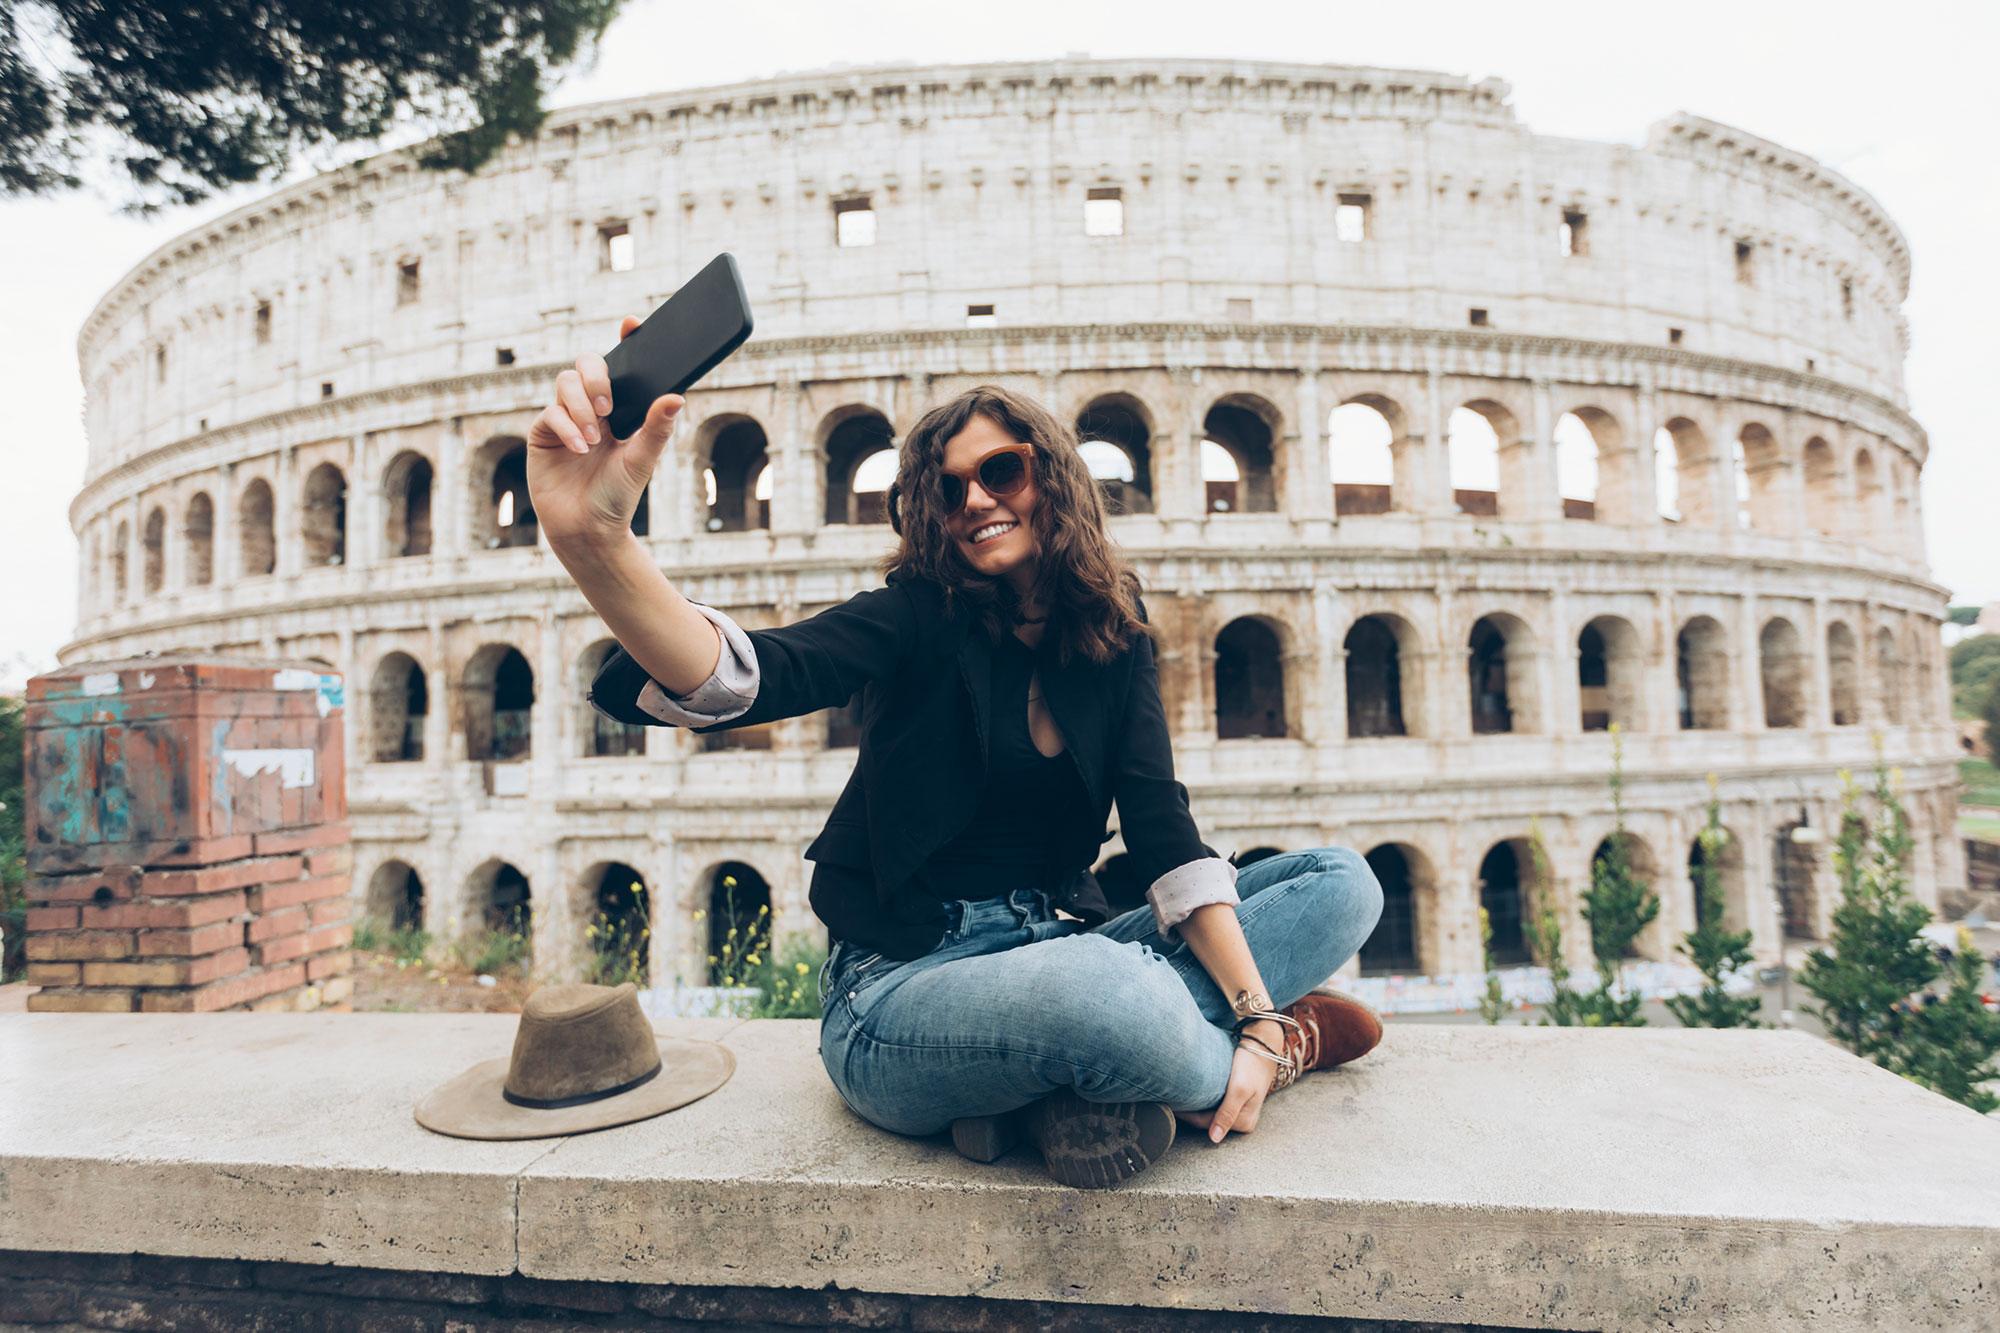 Explore the Coliseum, Rome, Italy